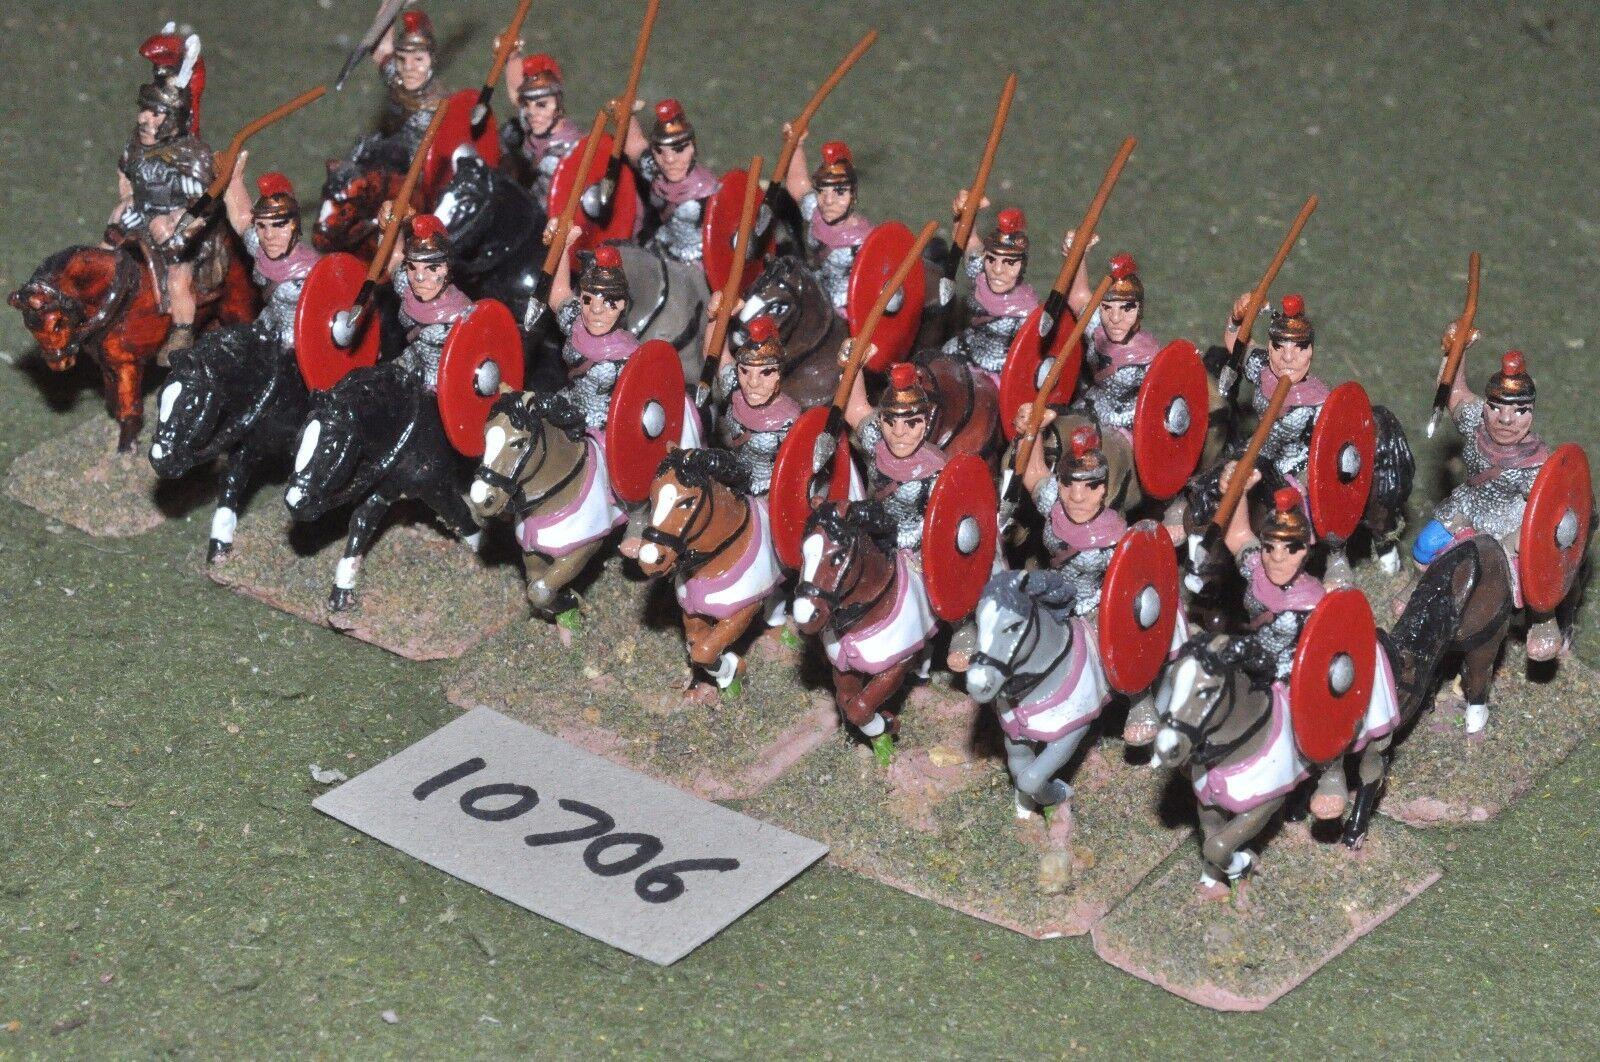 bajo precio 25mm época Romana caballería romana 16 de Caballería-CAV (10706) (10706) (10706)  en linea